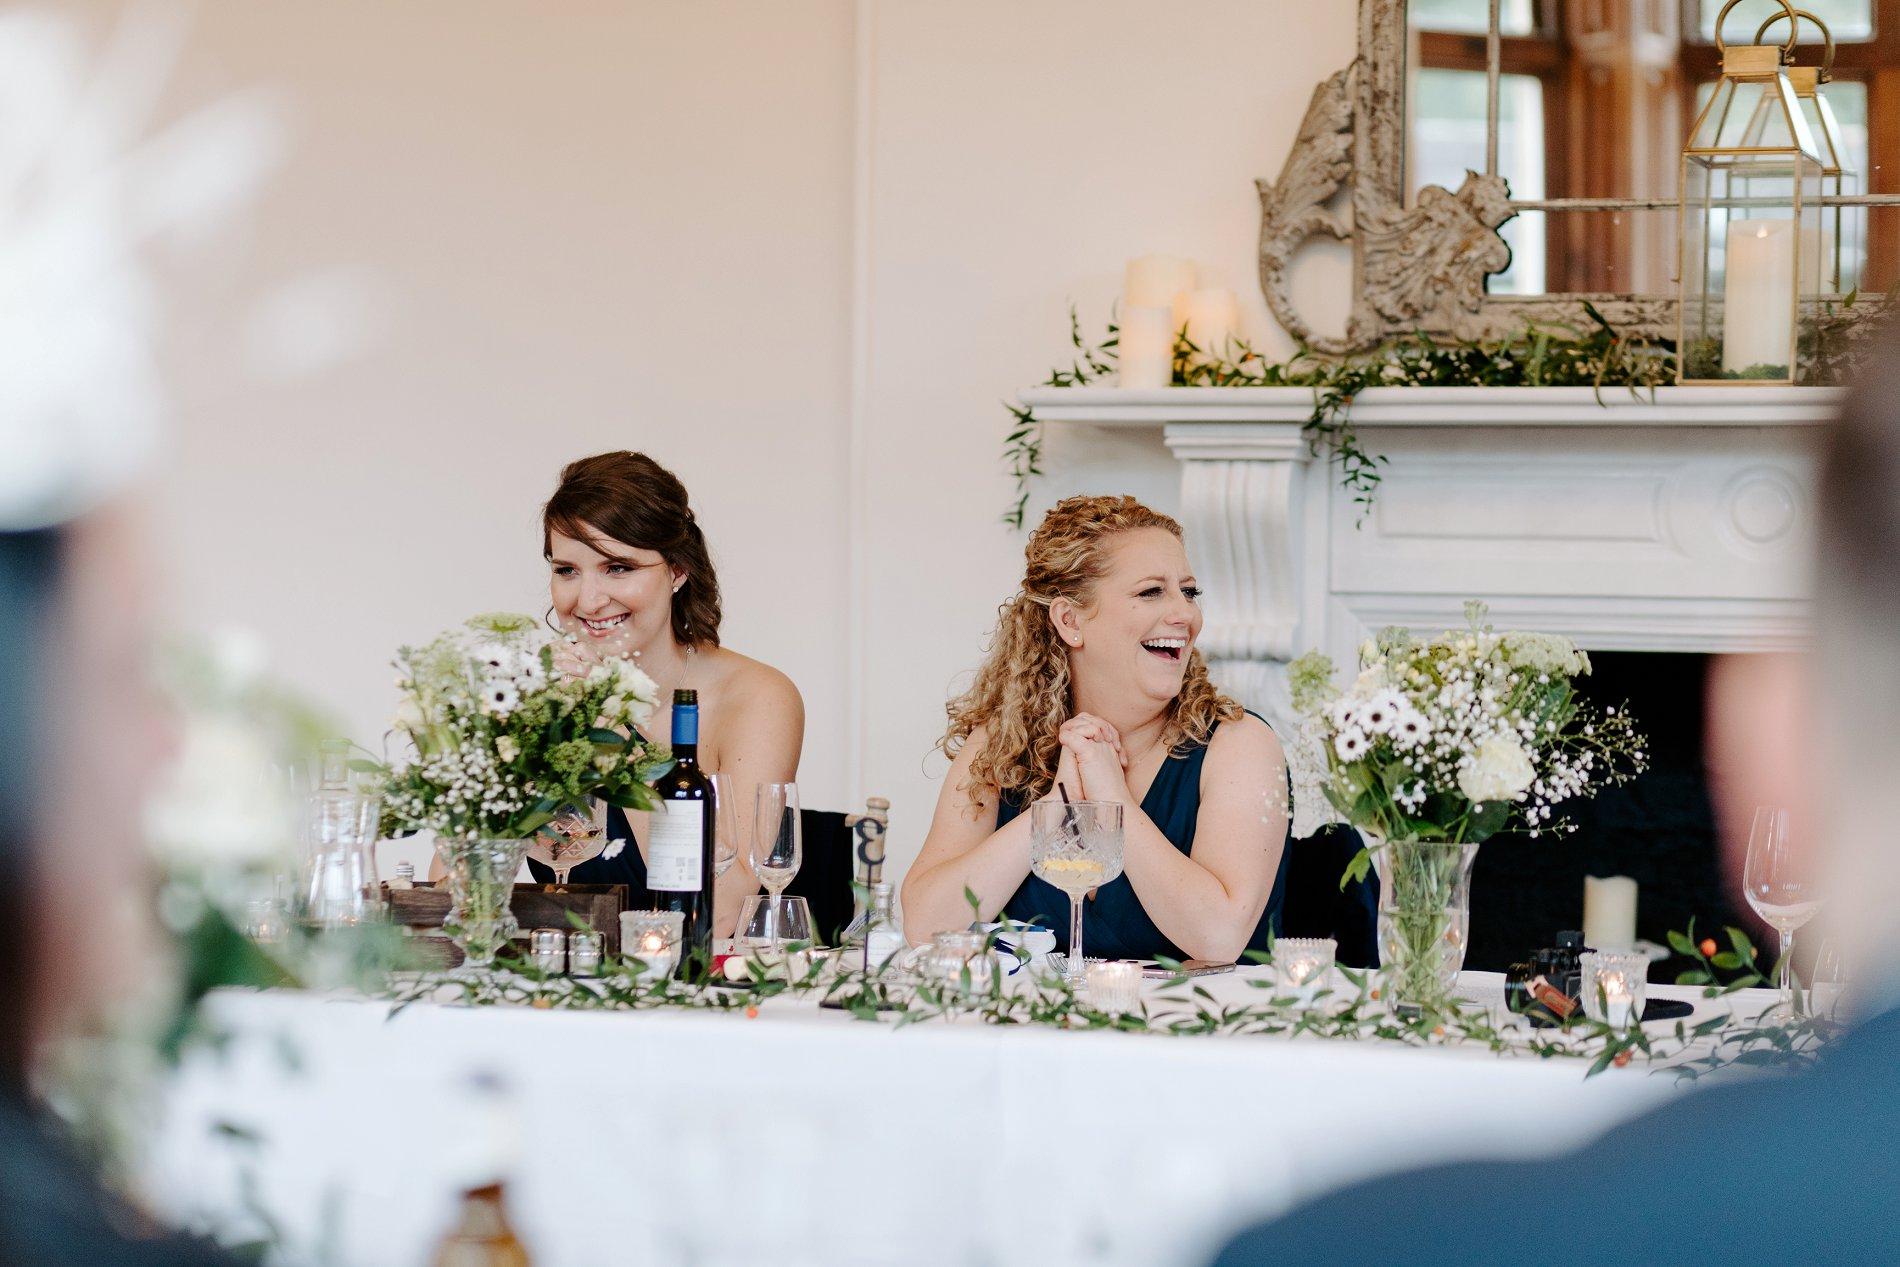 An Elegant White Wedding at Thicket Priory (c) Carla Whittingham Photography (66)